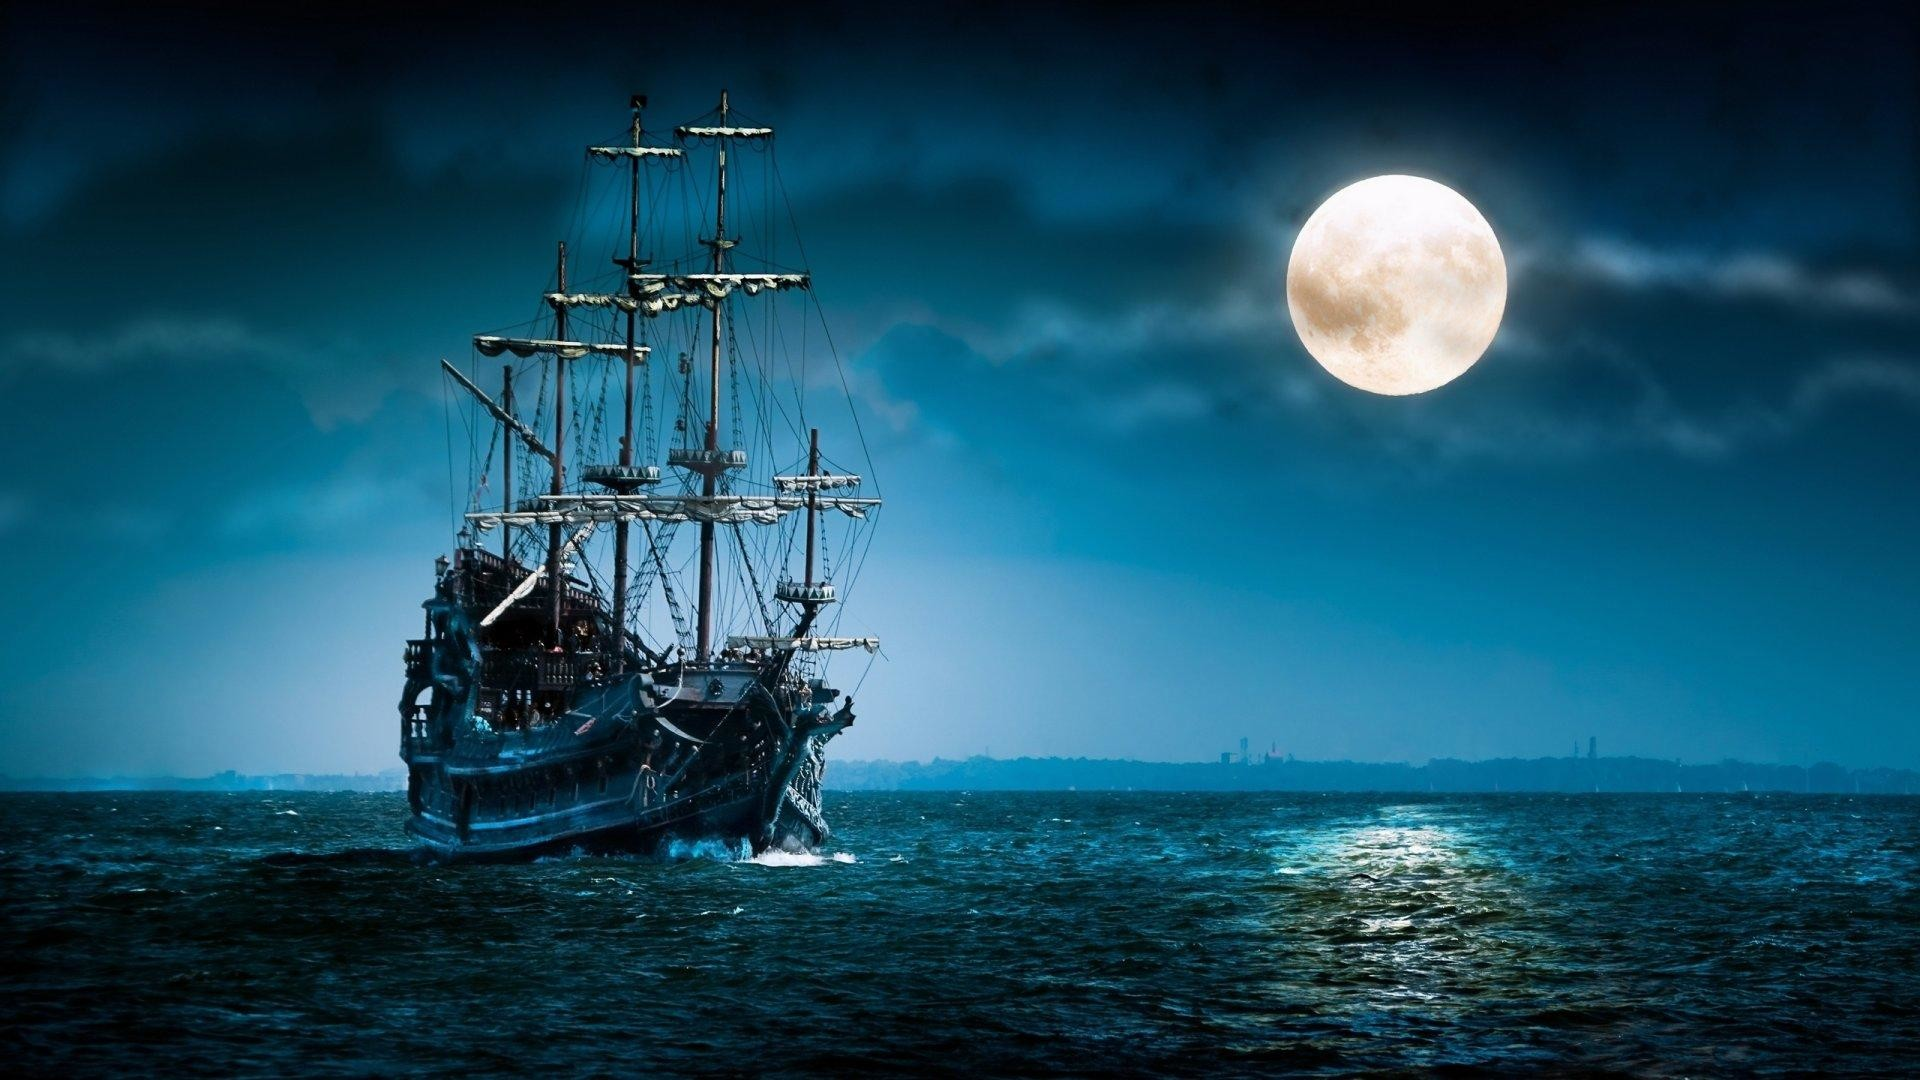 Sailboat-sea-moon-ship-boat-ocean-night-mood-